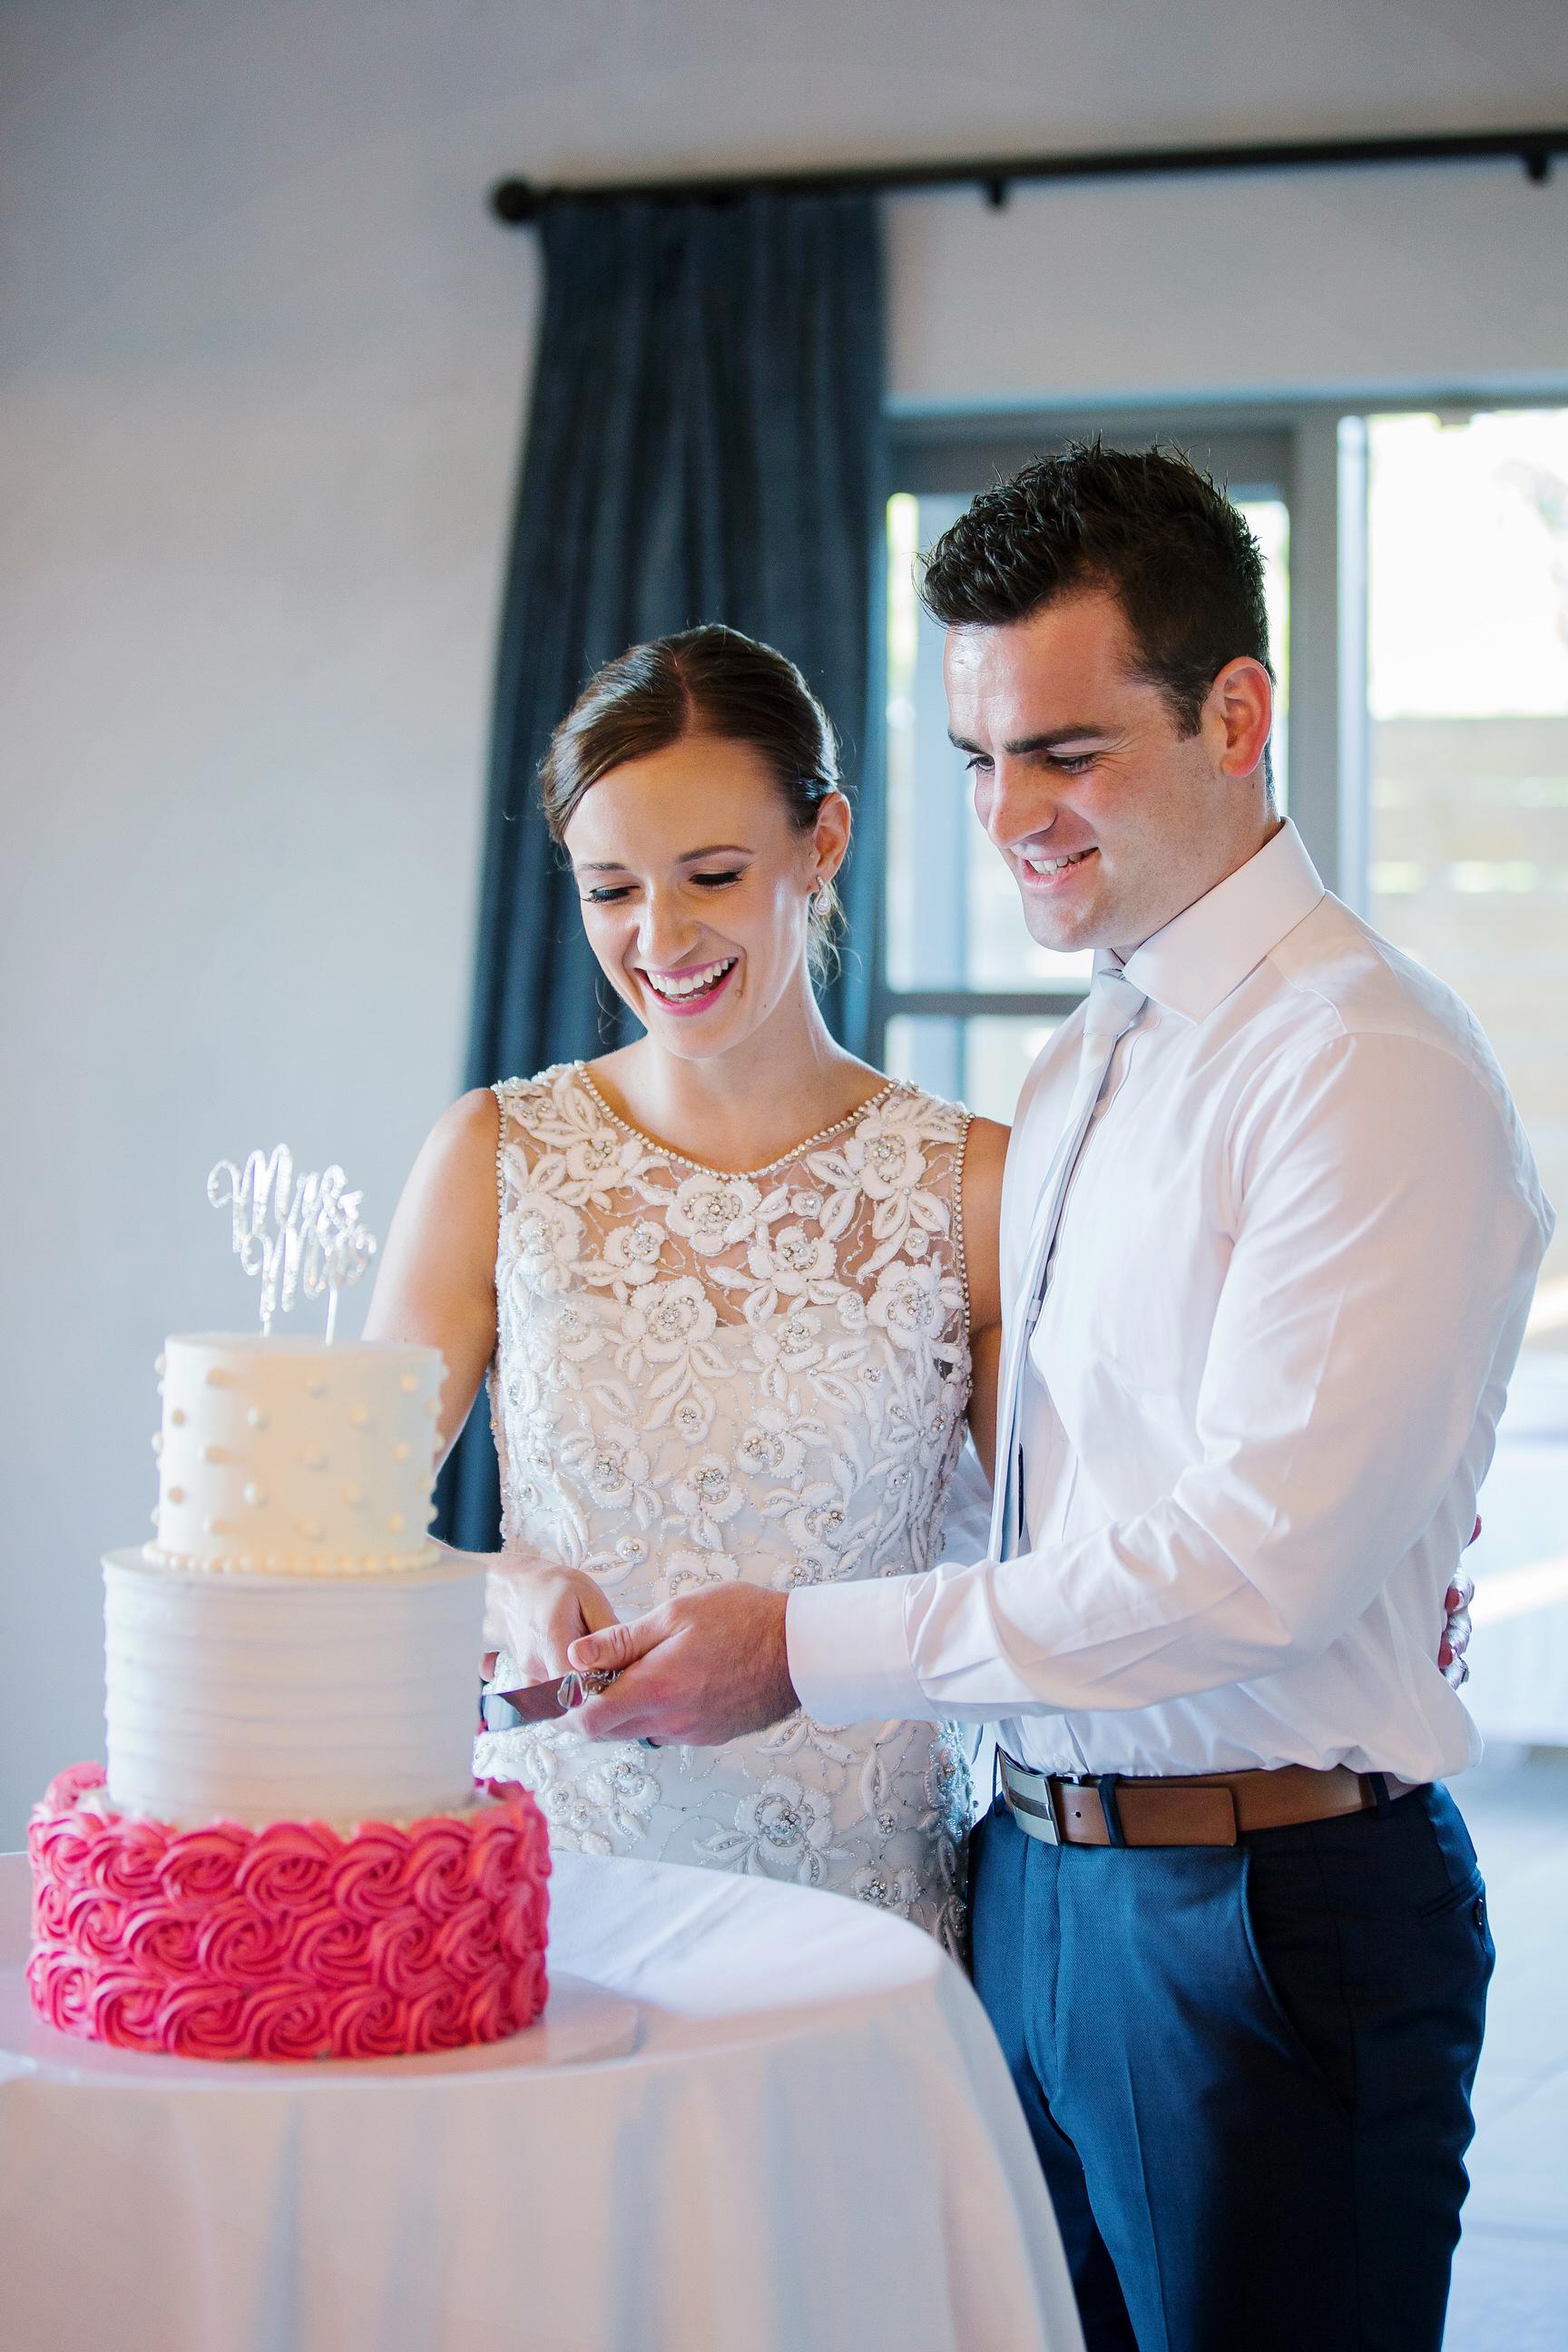 Martinborough-Poppies-Wedding-Caine-Eloise-Toni-Larsen-0139.jpg